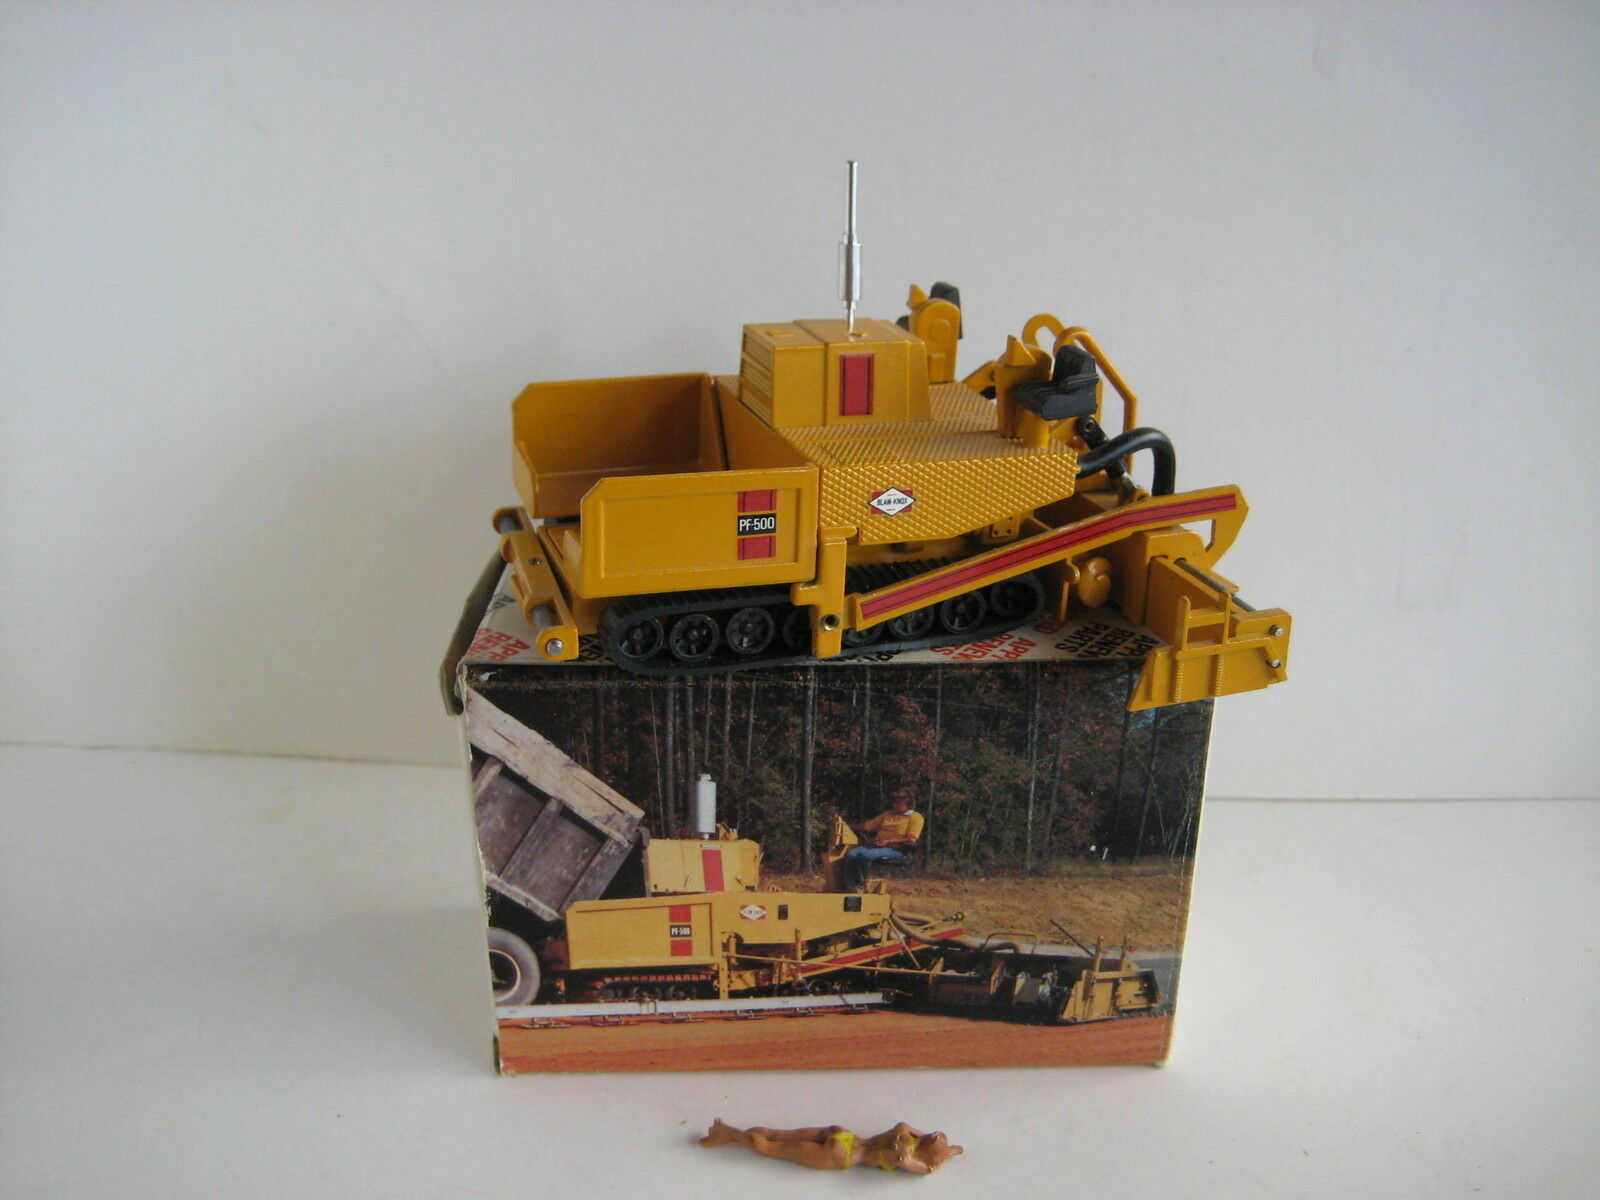 BLAW KNOX PF PF PF 500 finaux à chenilles #290 NZG 1:50 neuf dans sa boîte | Modèles à La Mode  f39143